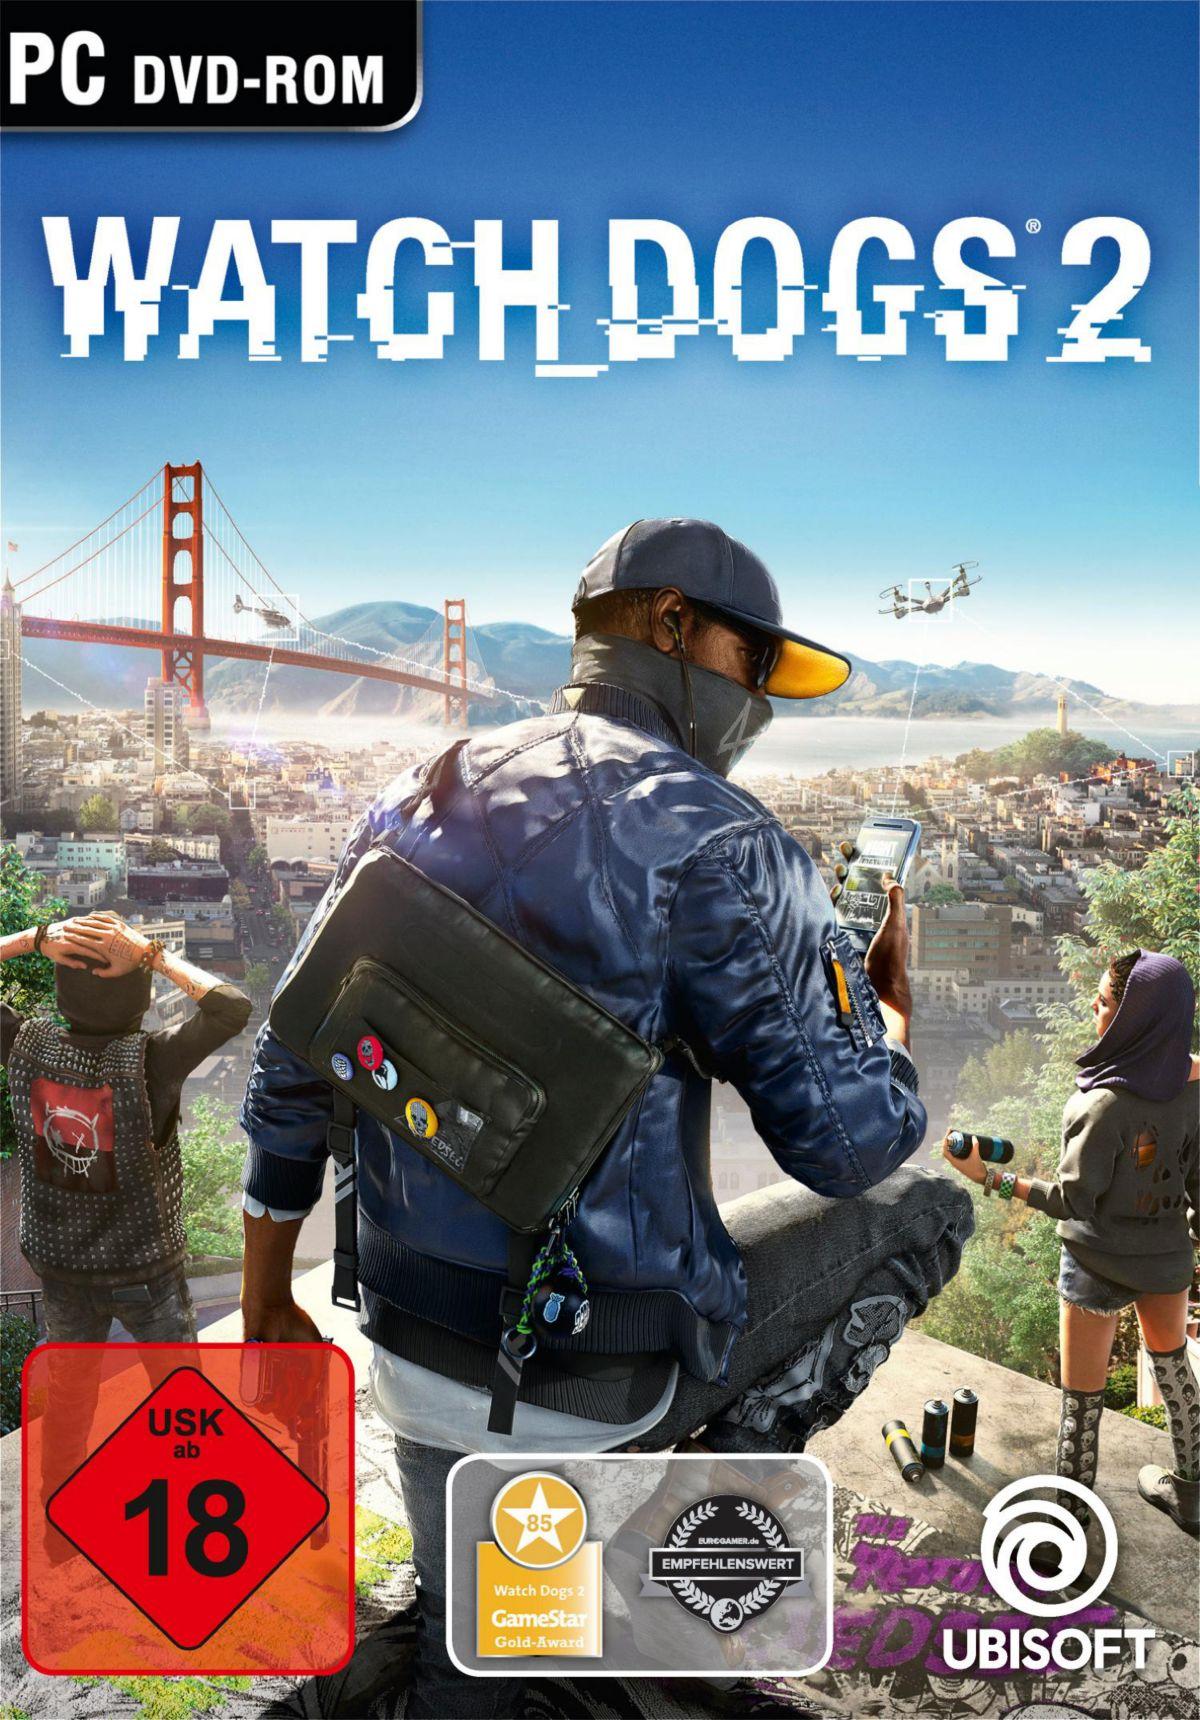 Watch Dogs 2 PC (Blu-ray Disc)